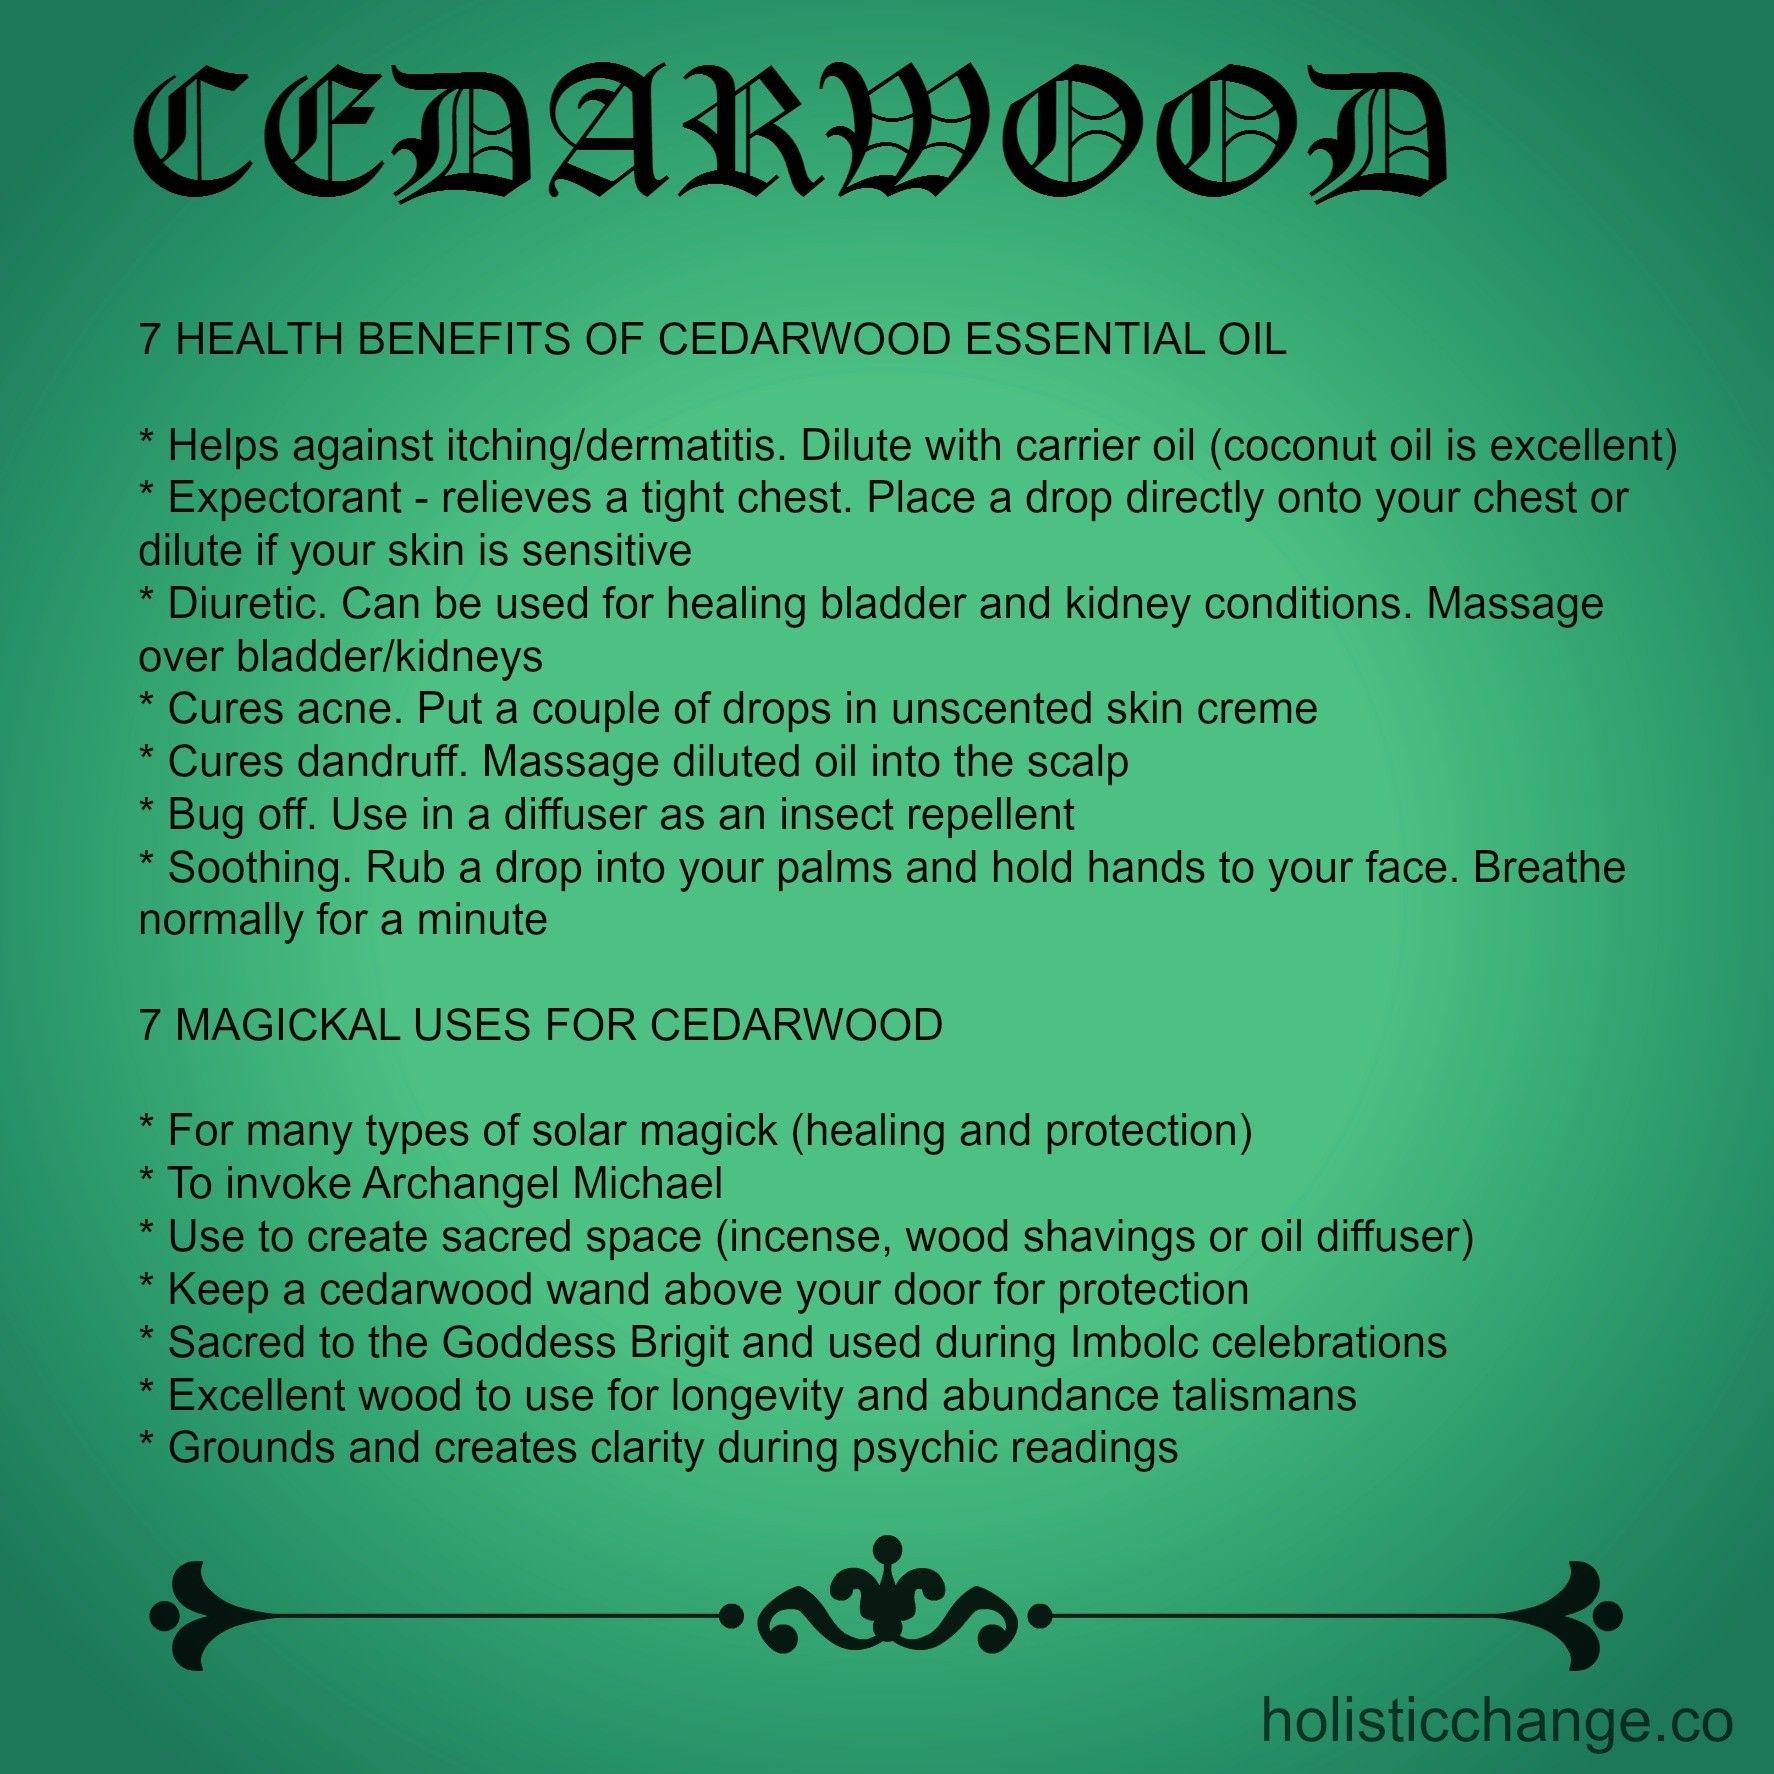 Cedarwood - 7 Health Benefits and 7 Magickal Properties